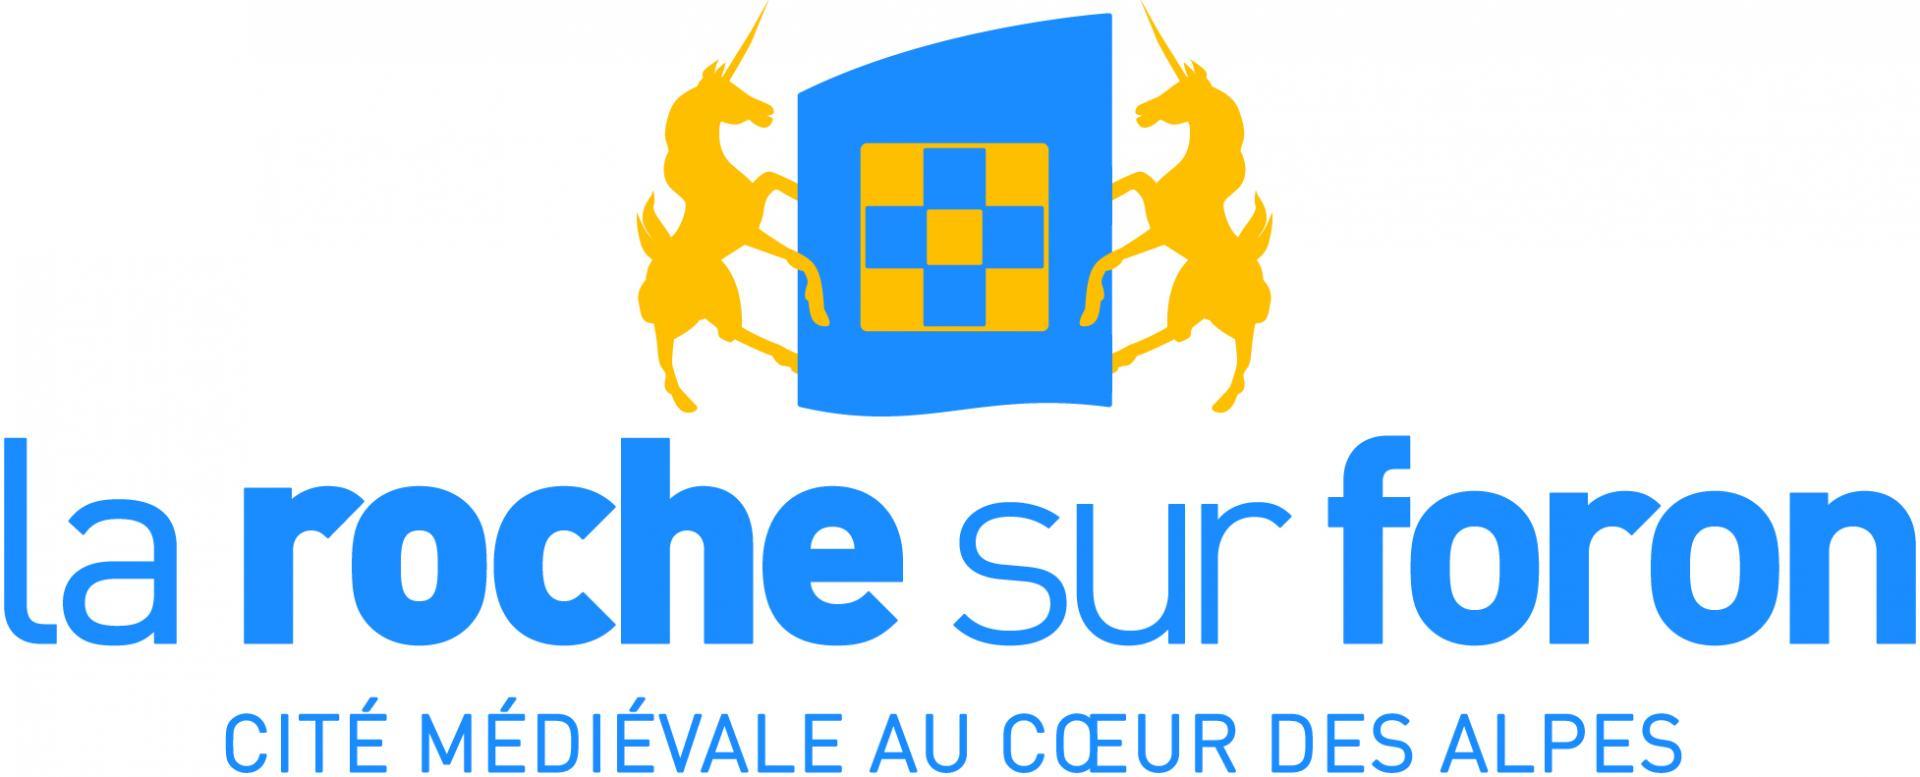 Lrsf logo 2016